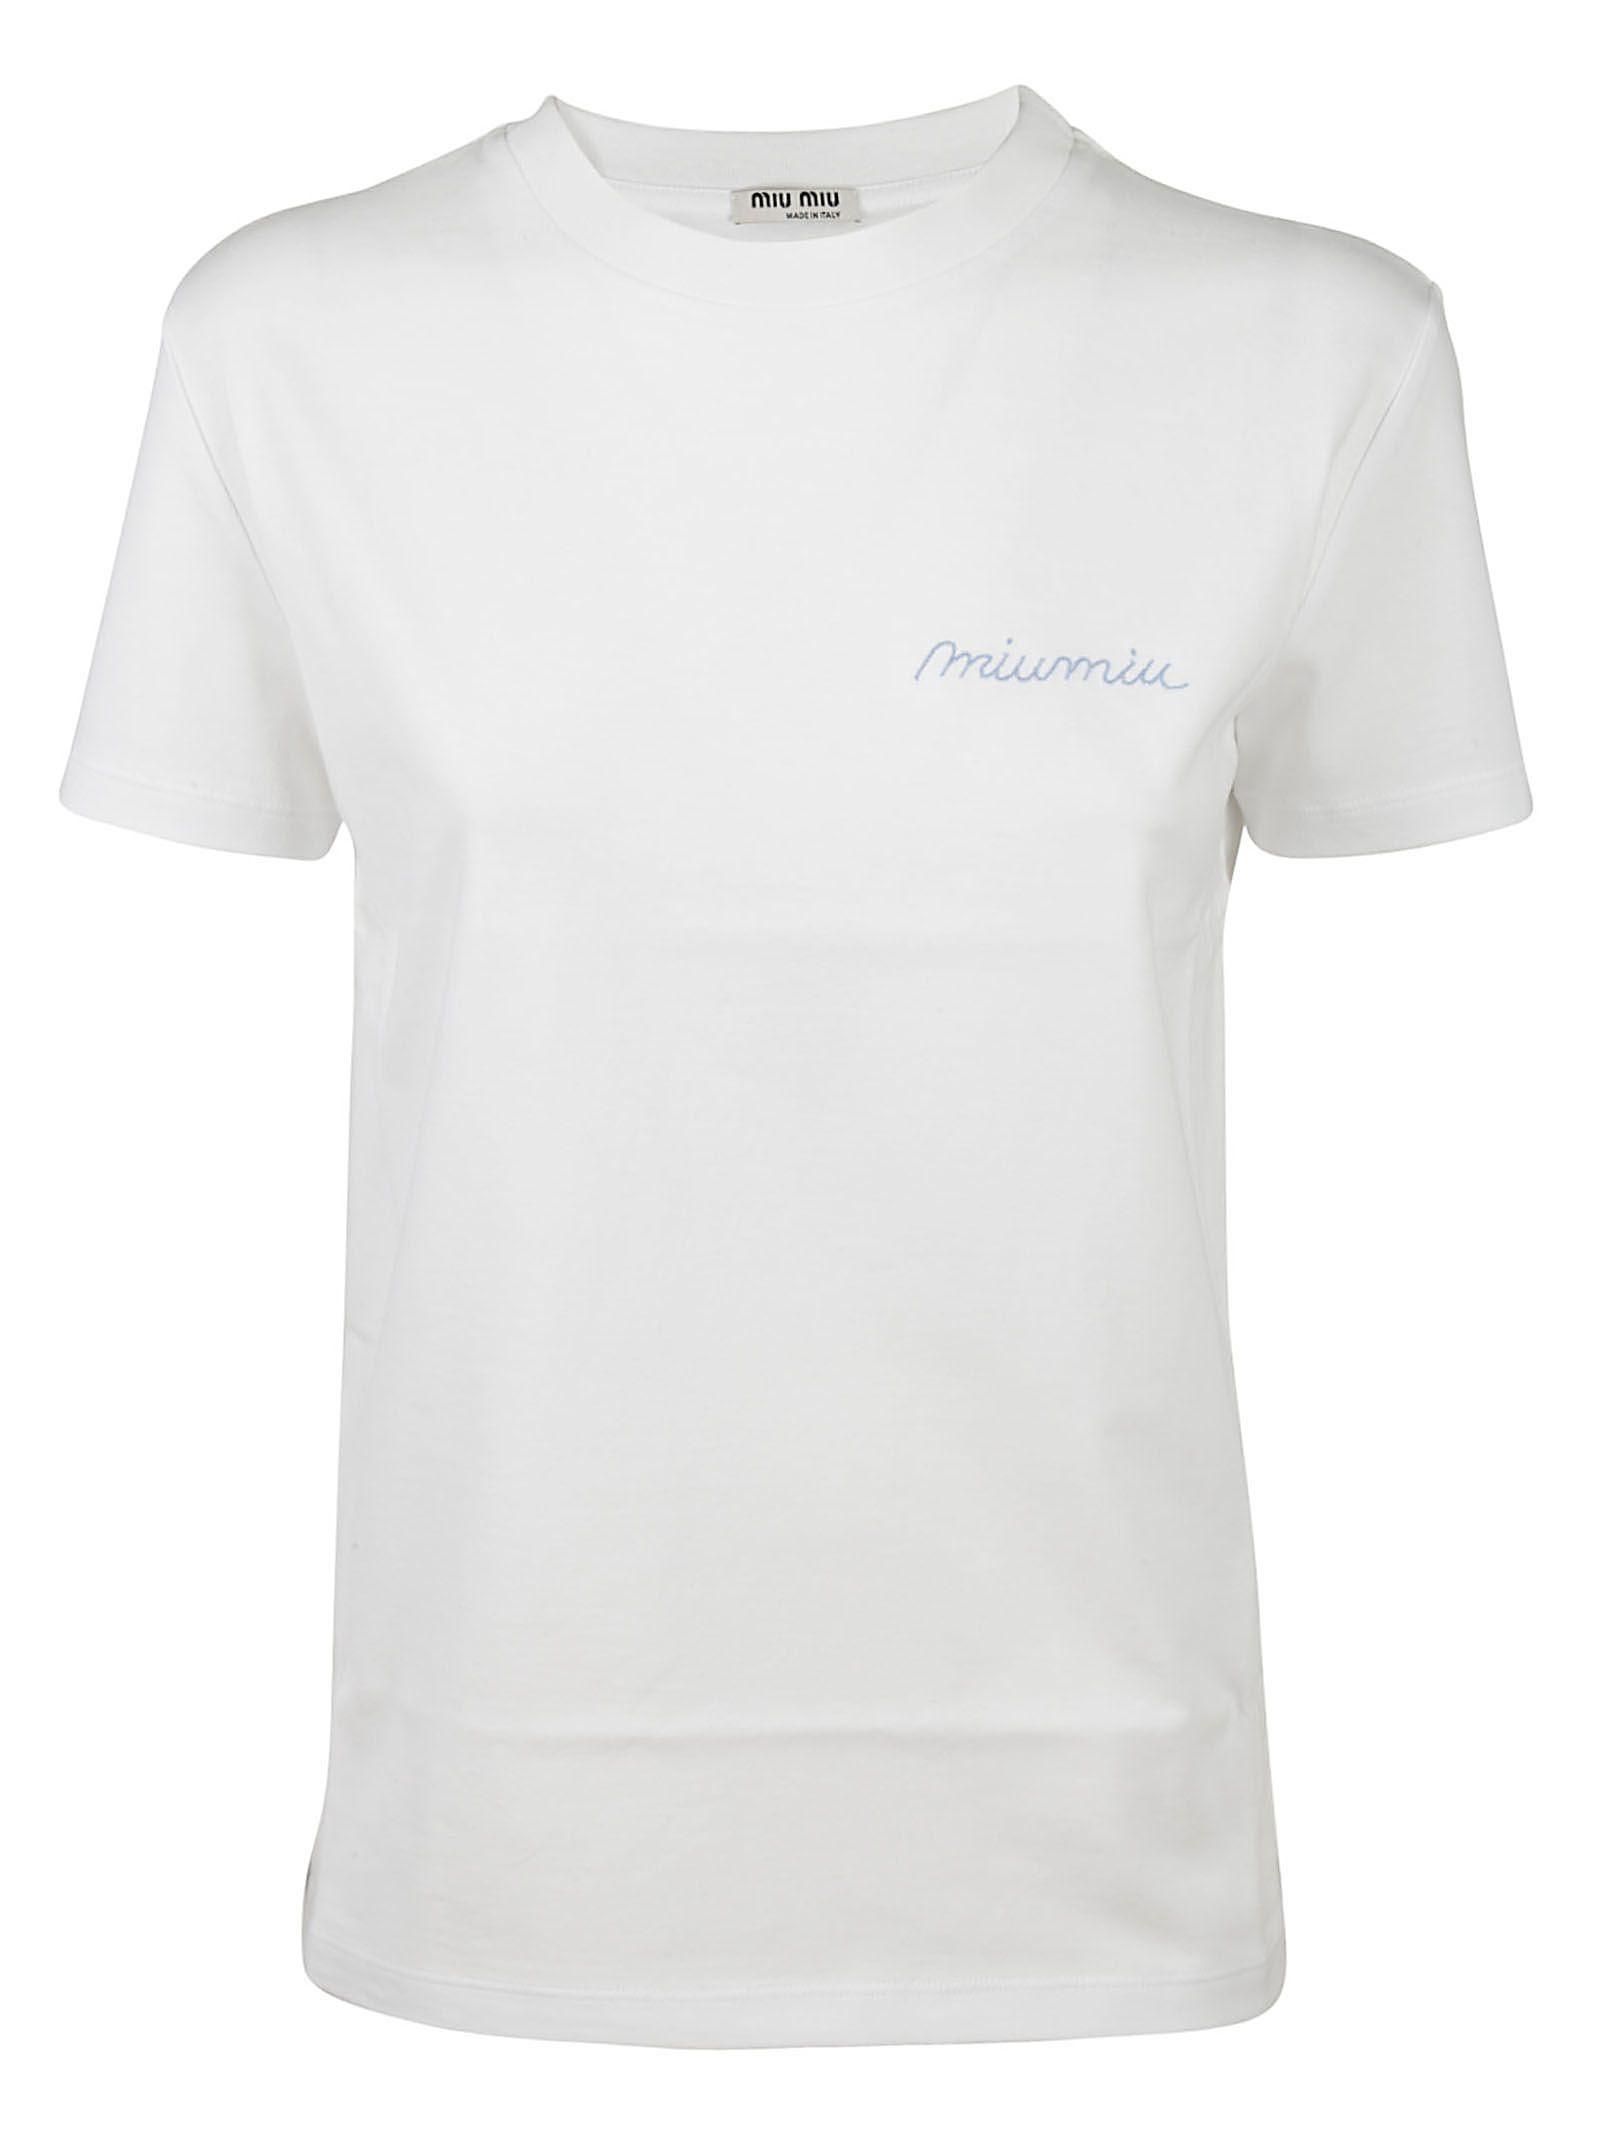 Miu miu miu miu logo embroidered t shirt bianco women for Miu miu t shirt